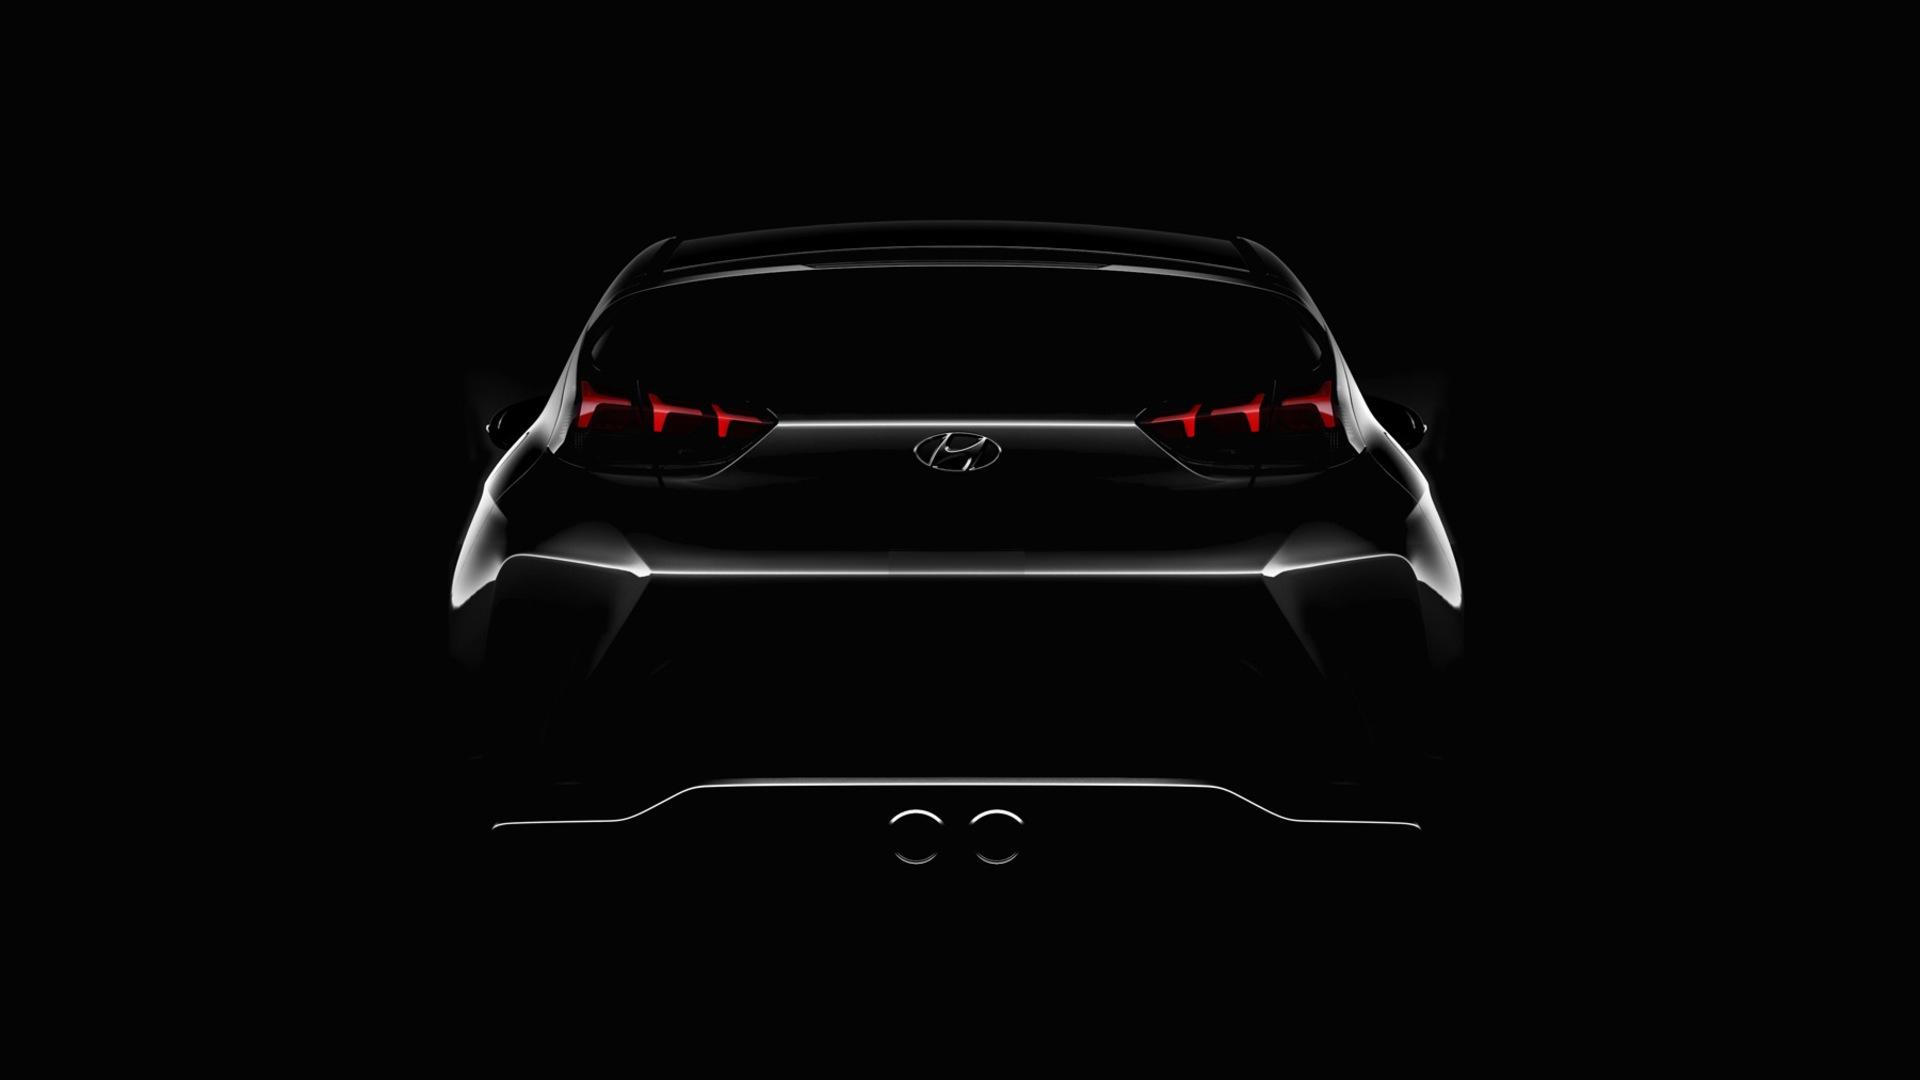 2019 Hyundai Veloster teased ahead of Detroit debut 1920x1080